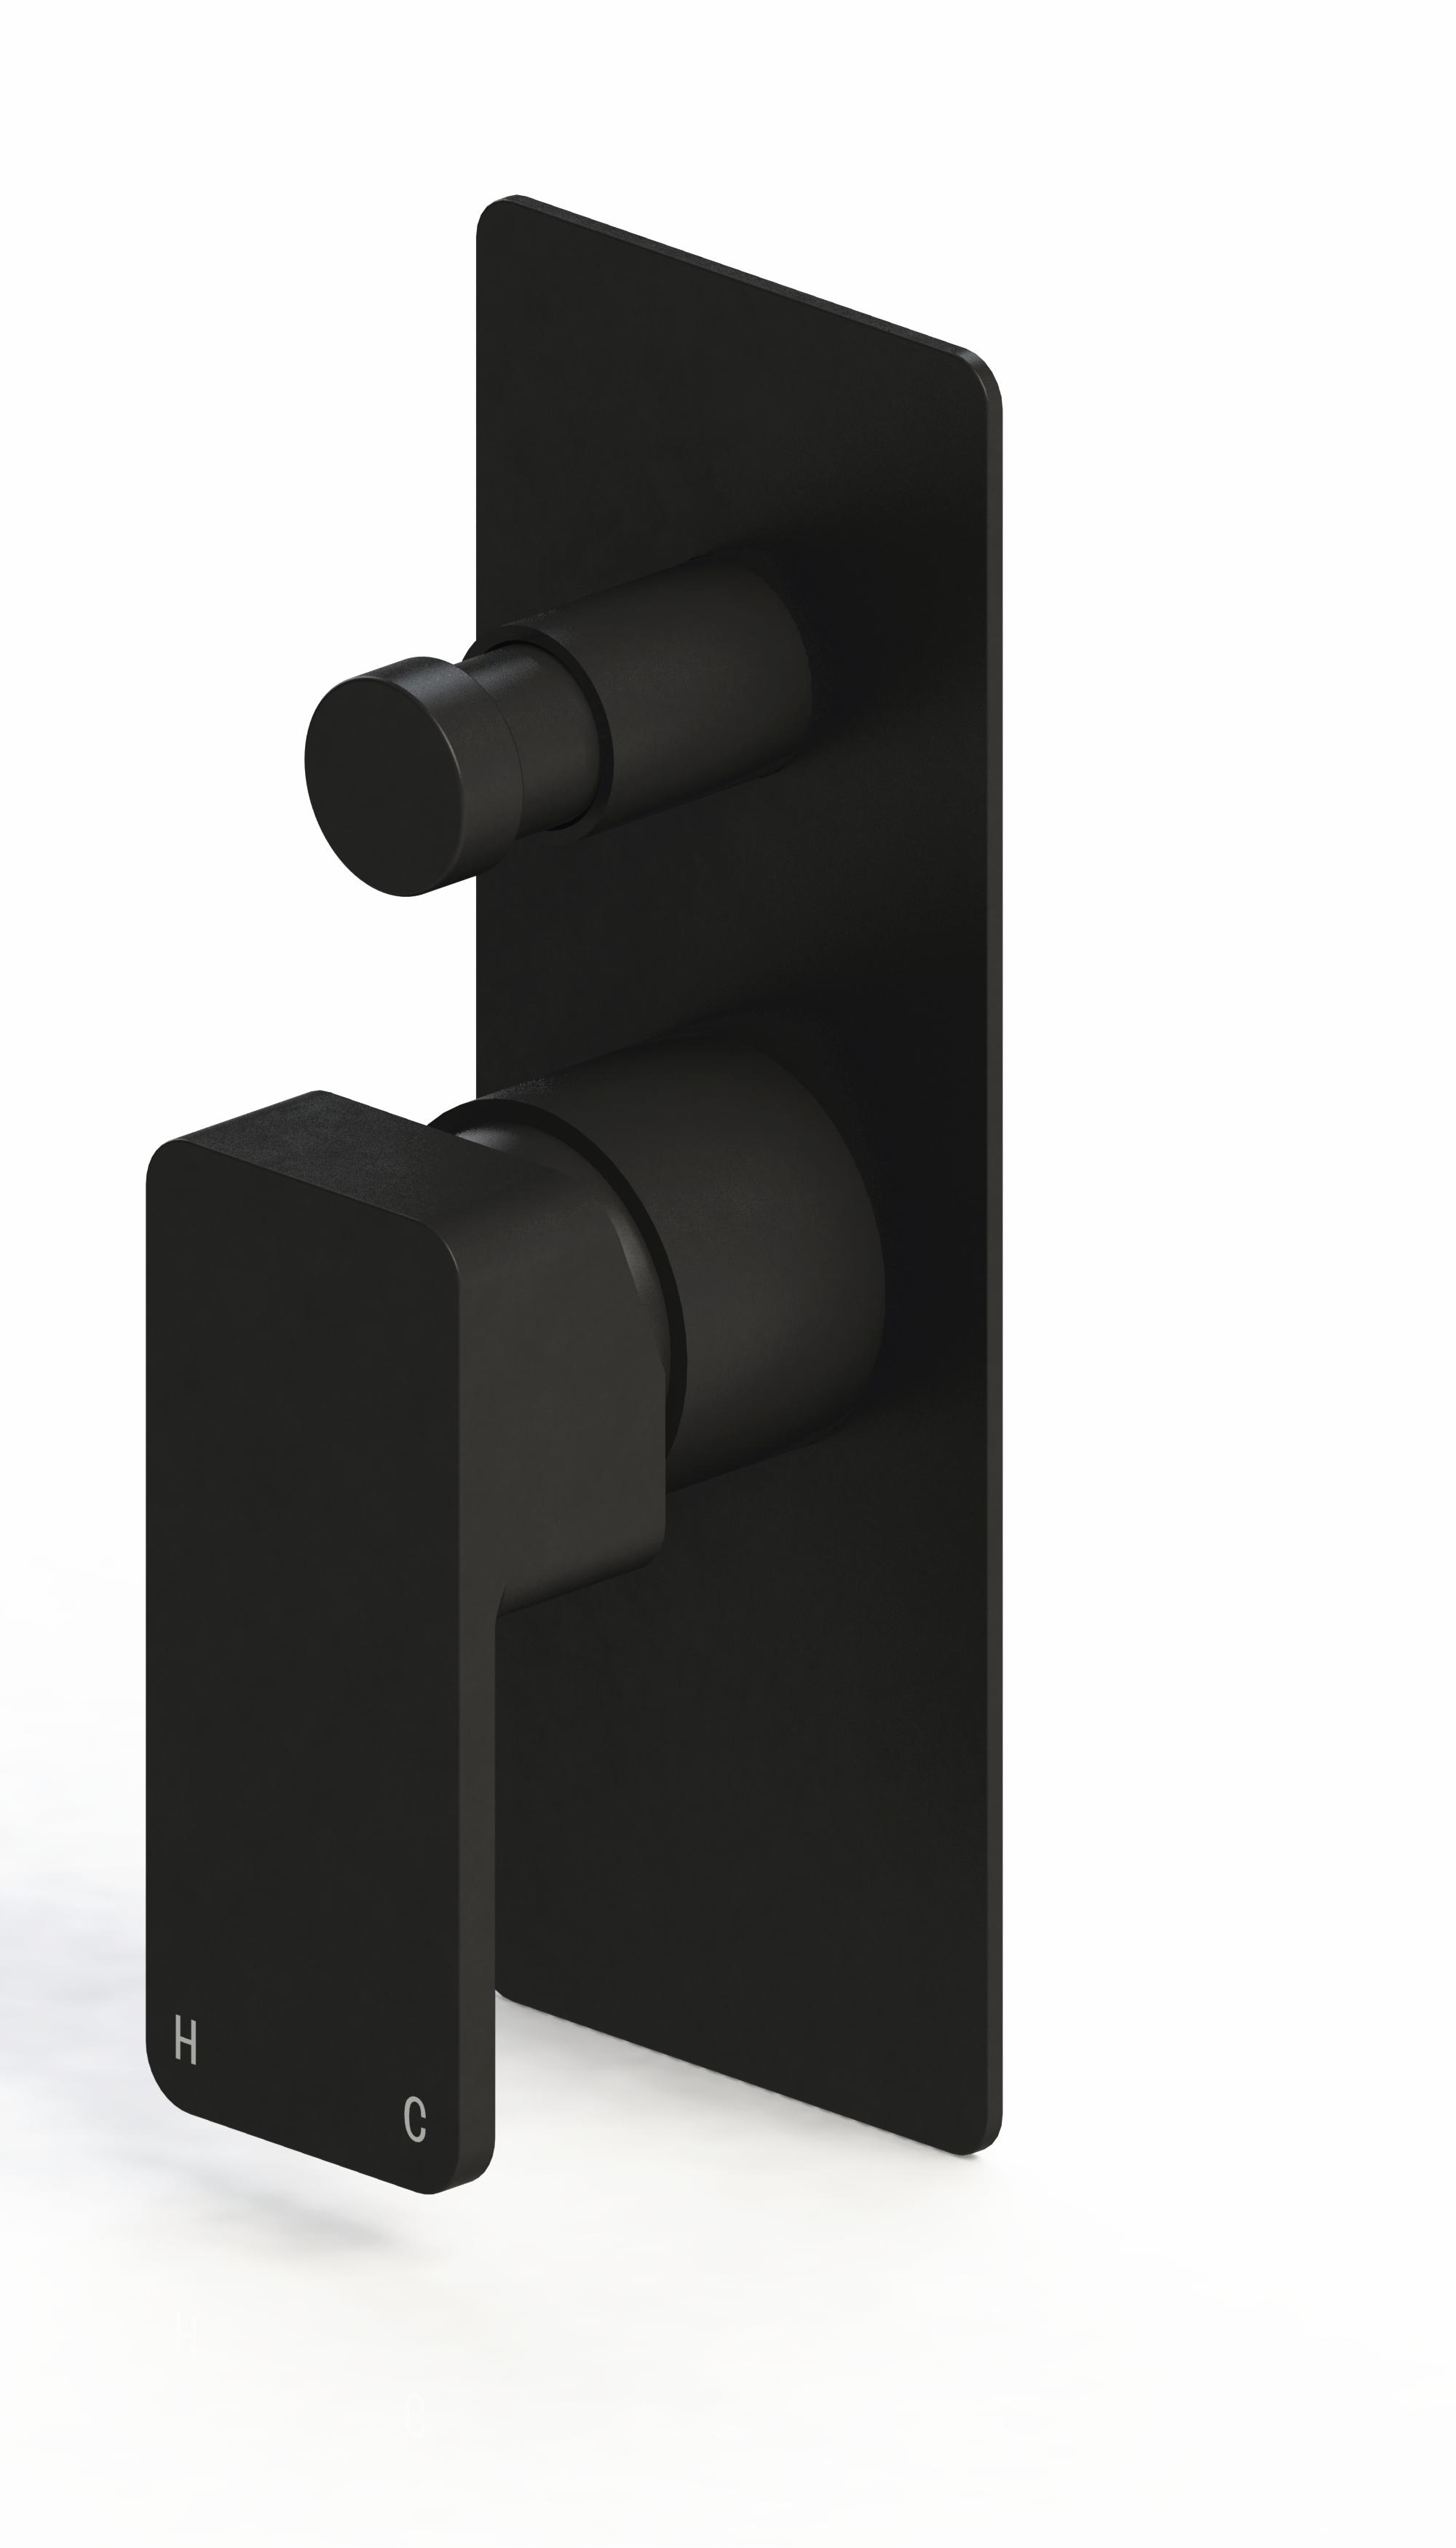 Harmony Rondo Solid Black Wall Diverter Mixer